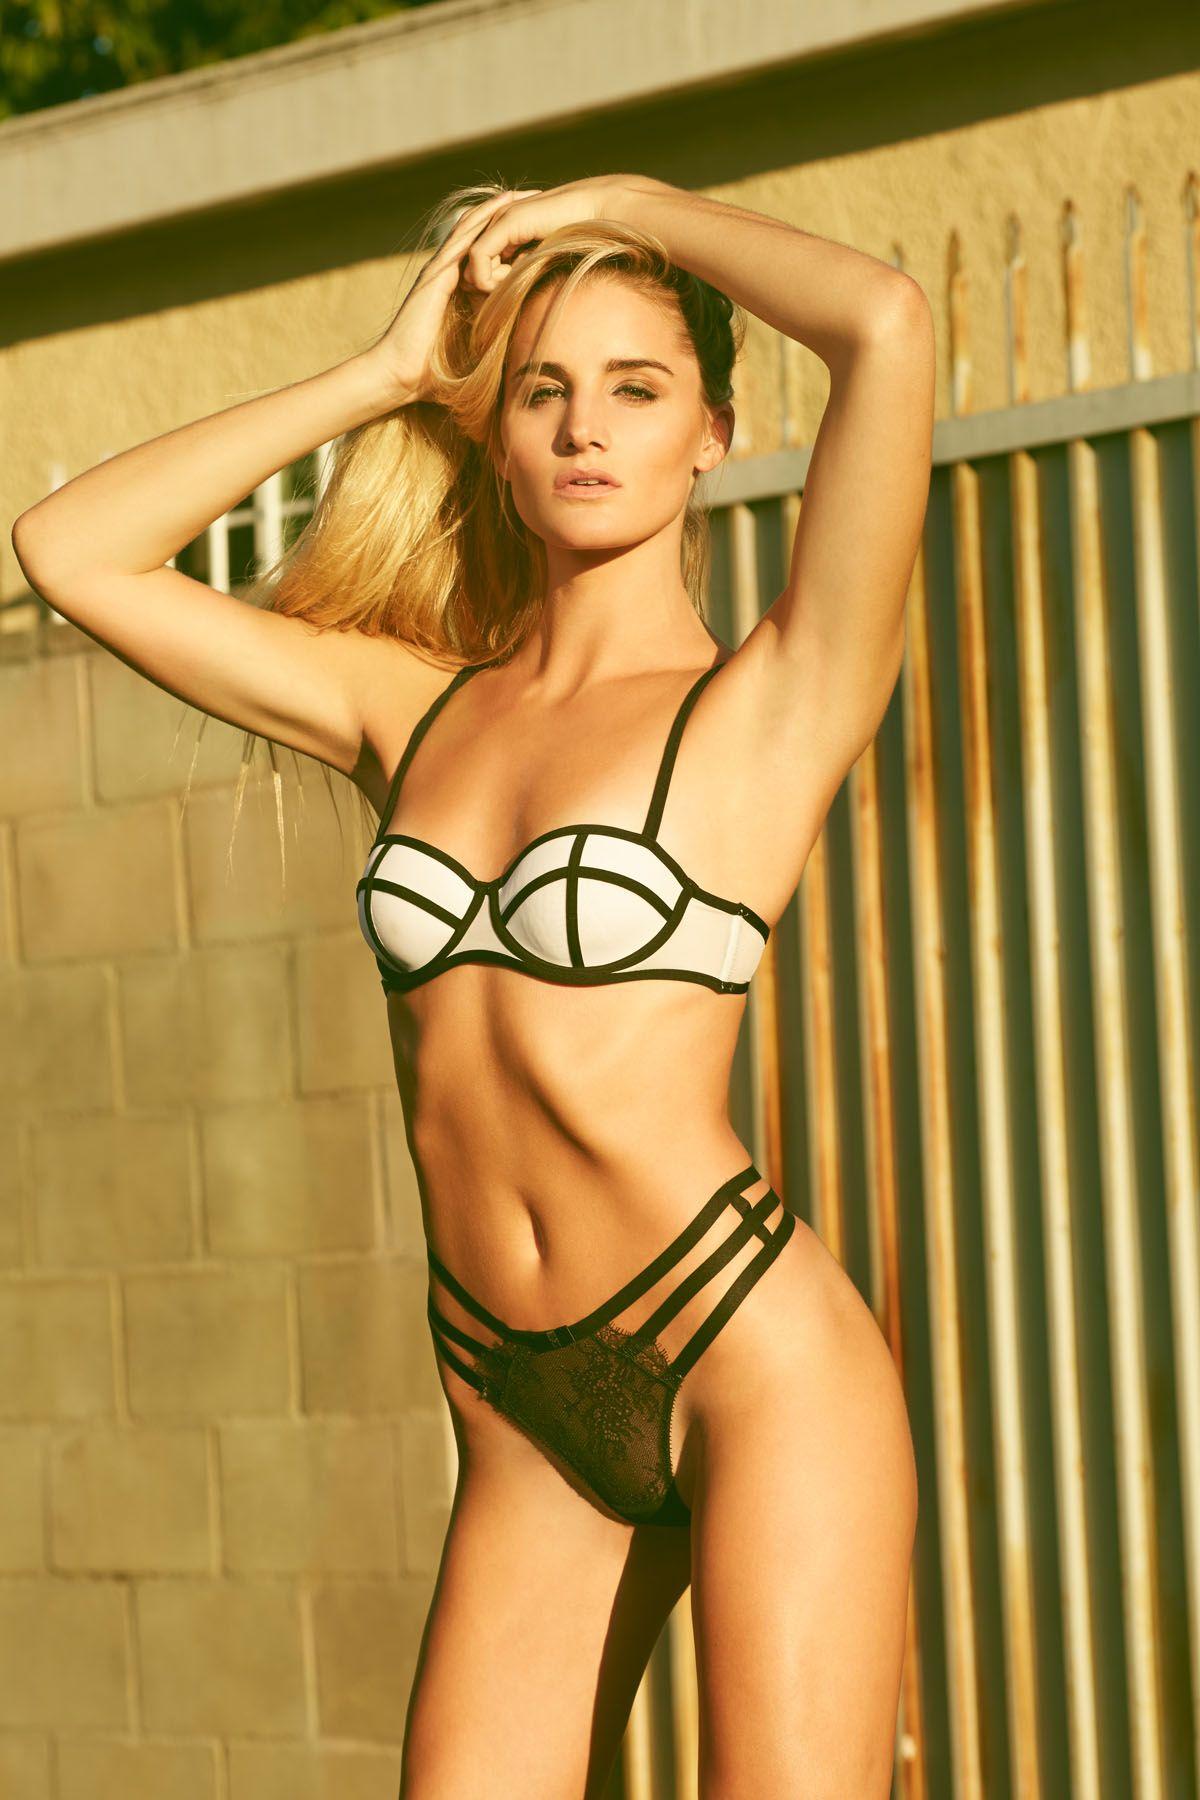 Bikini Dana Wright nude photos 2019